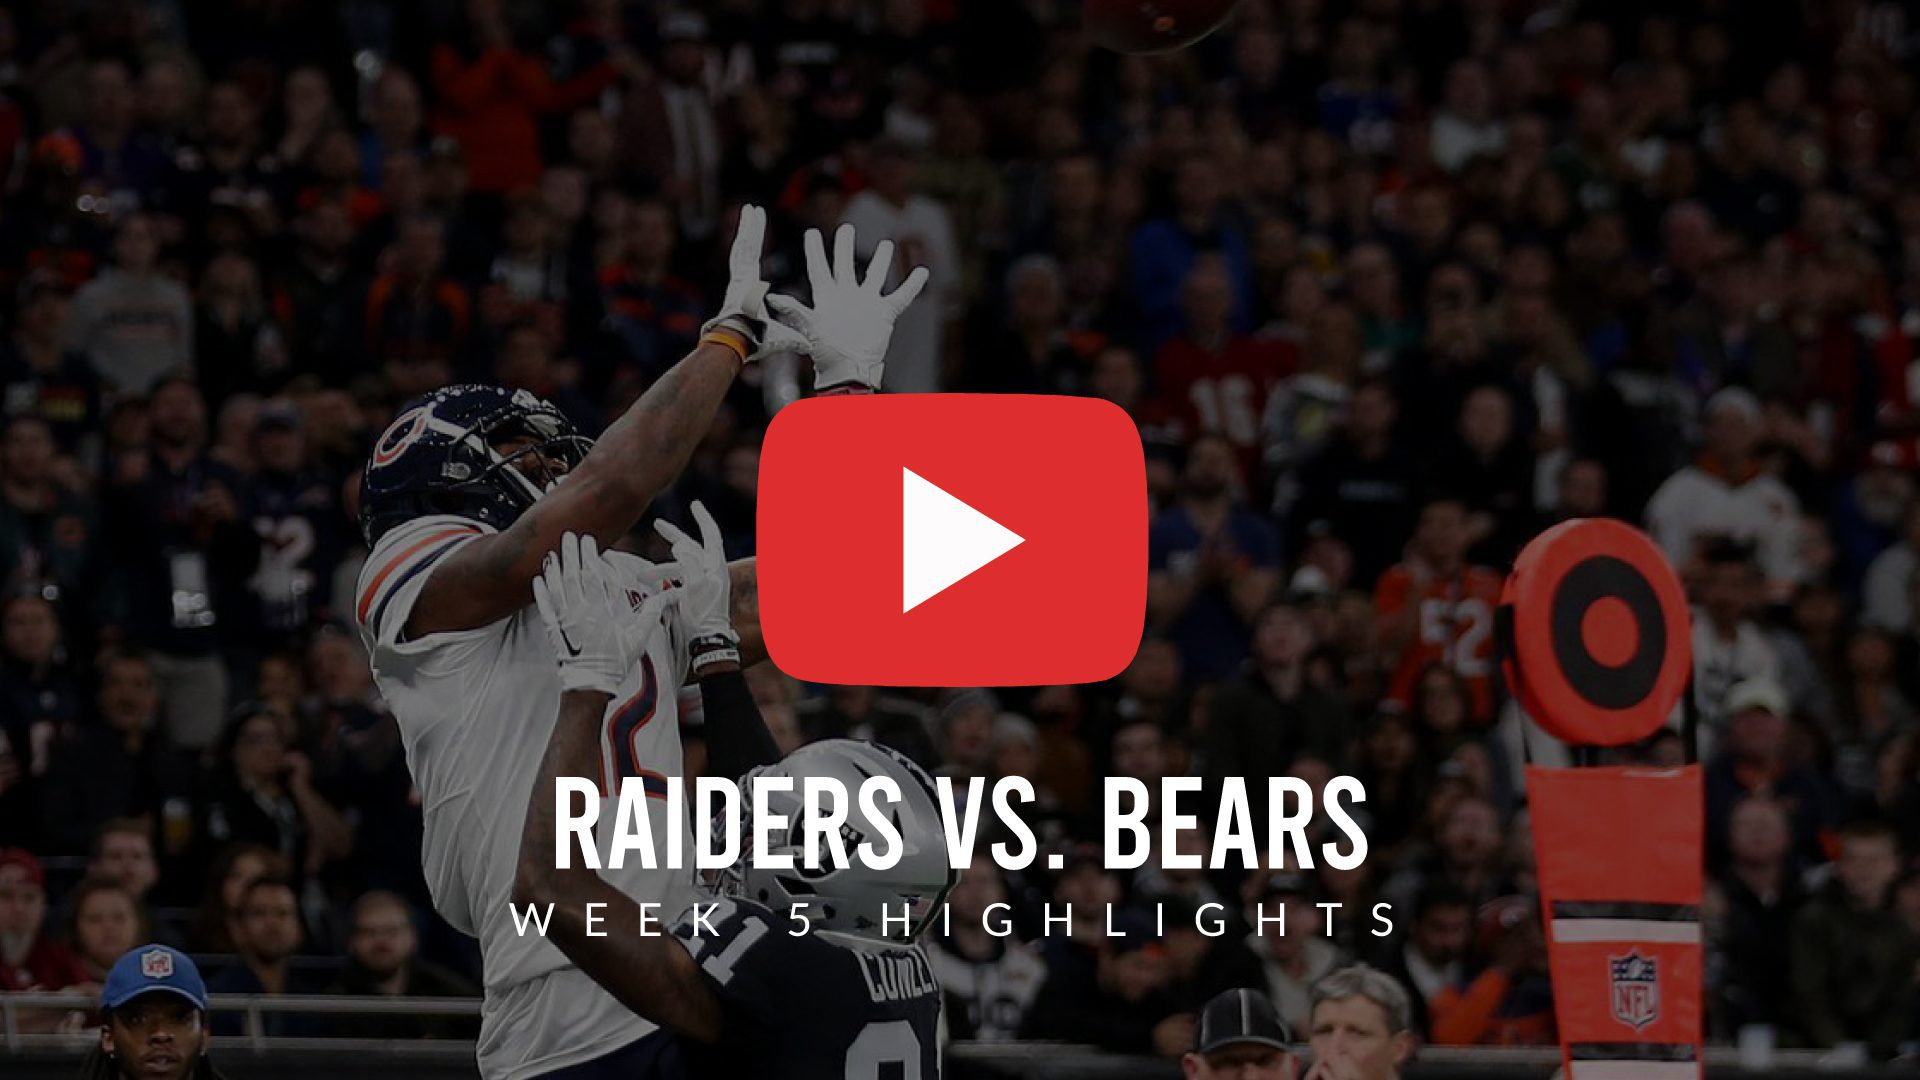 RAIDERS-BEARS